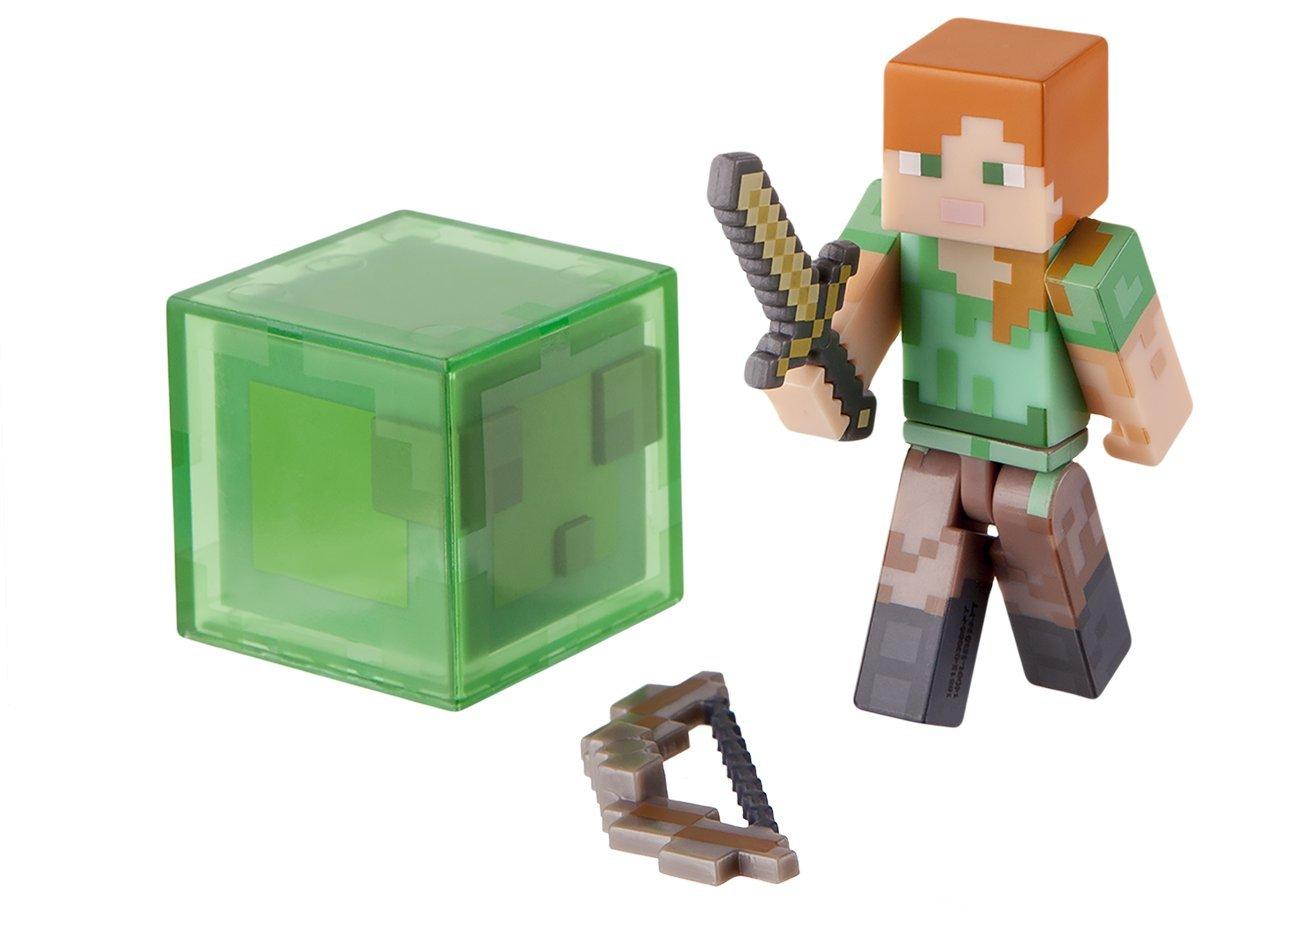 Minecraft - 16513 - Figurine Articulée avec Accessoires - Alex - Série 3 Jazwares 5522949